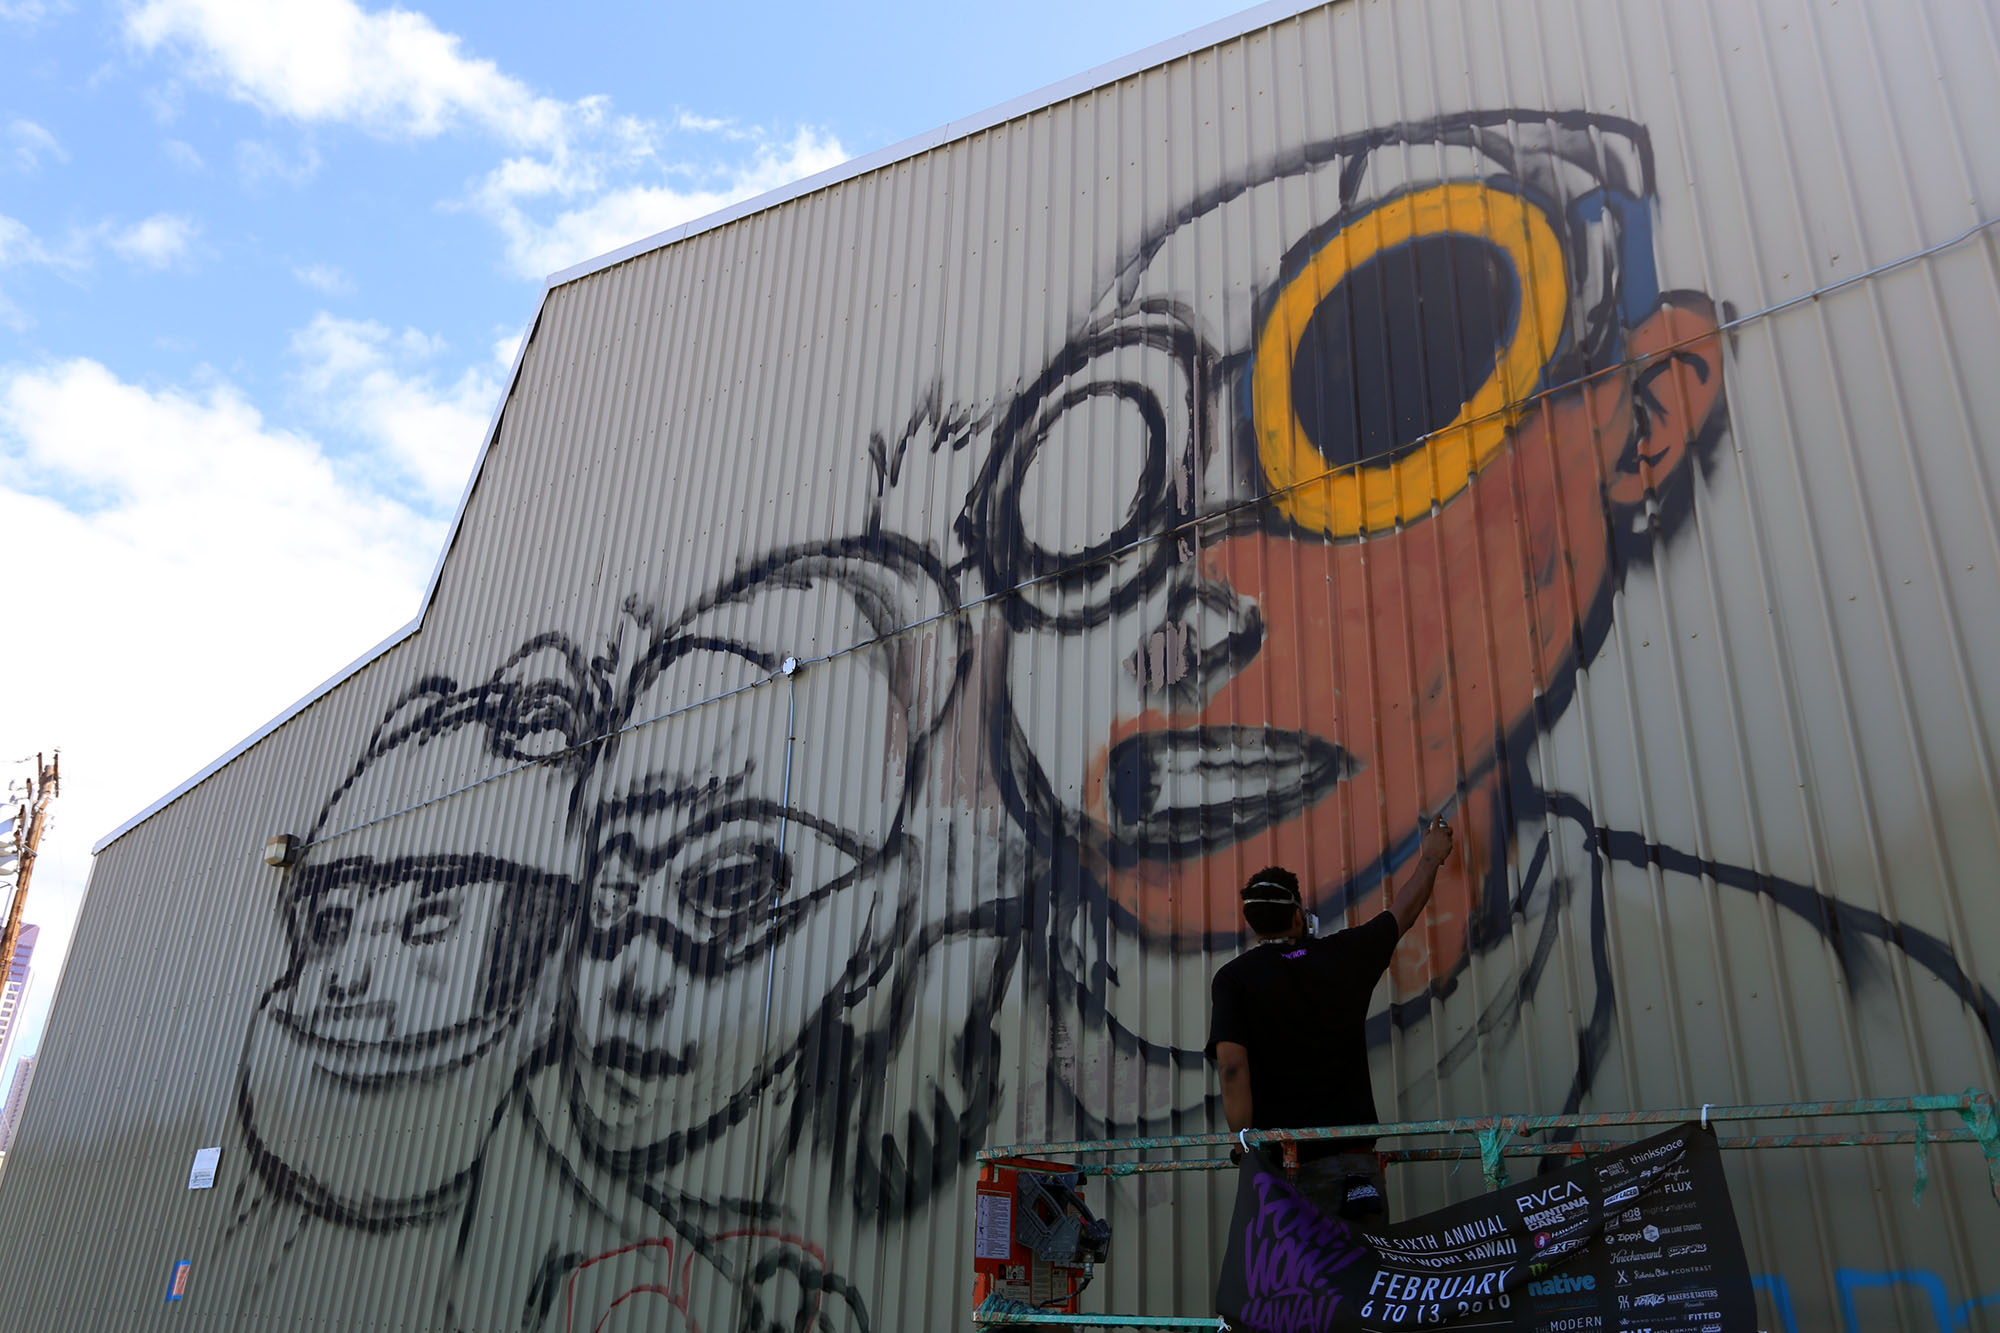 pow wow 2016 hawaii hebru brantley grafite mural dionisio arte (2)